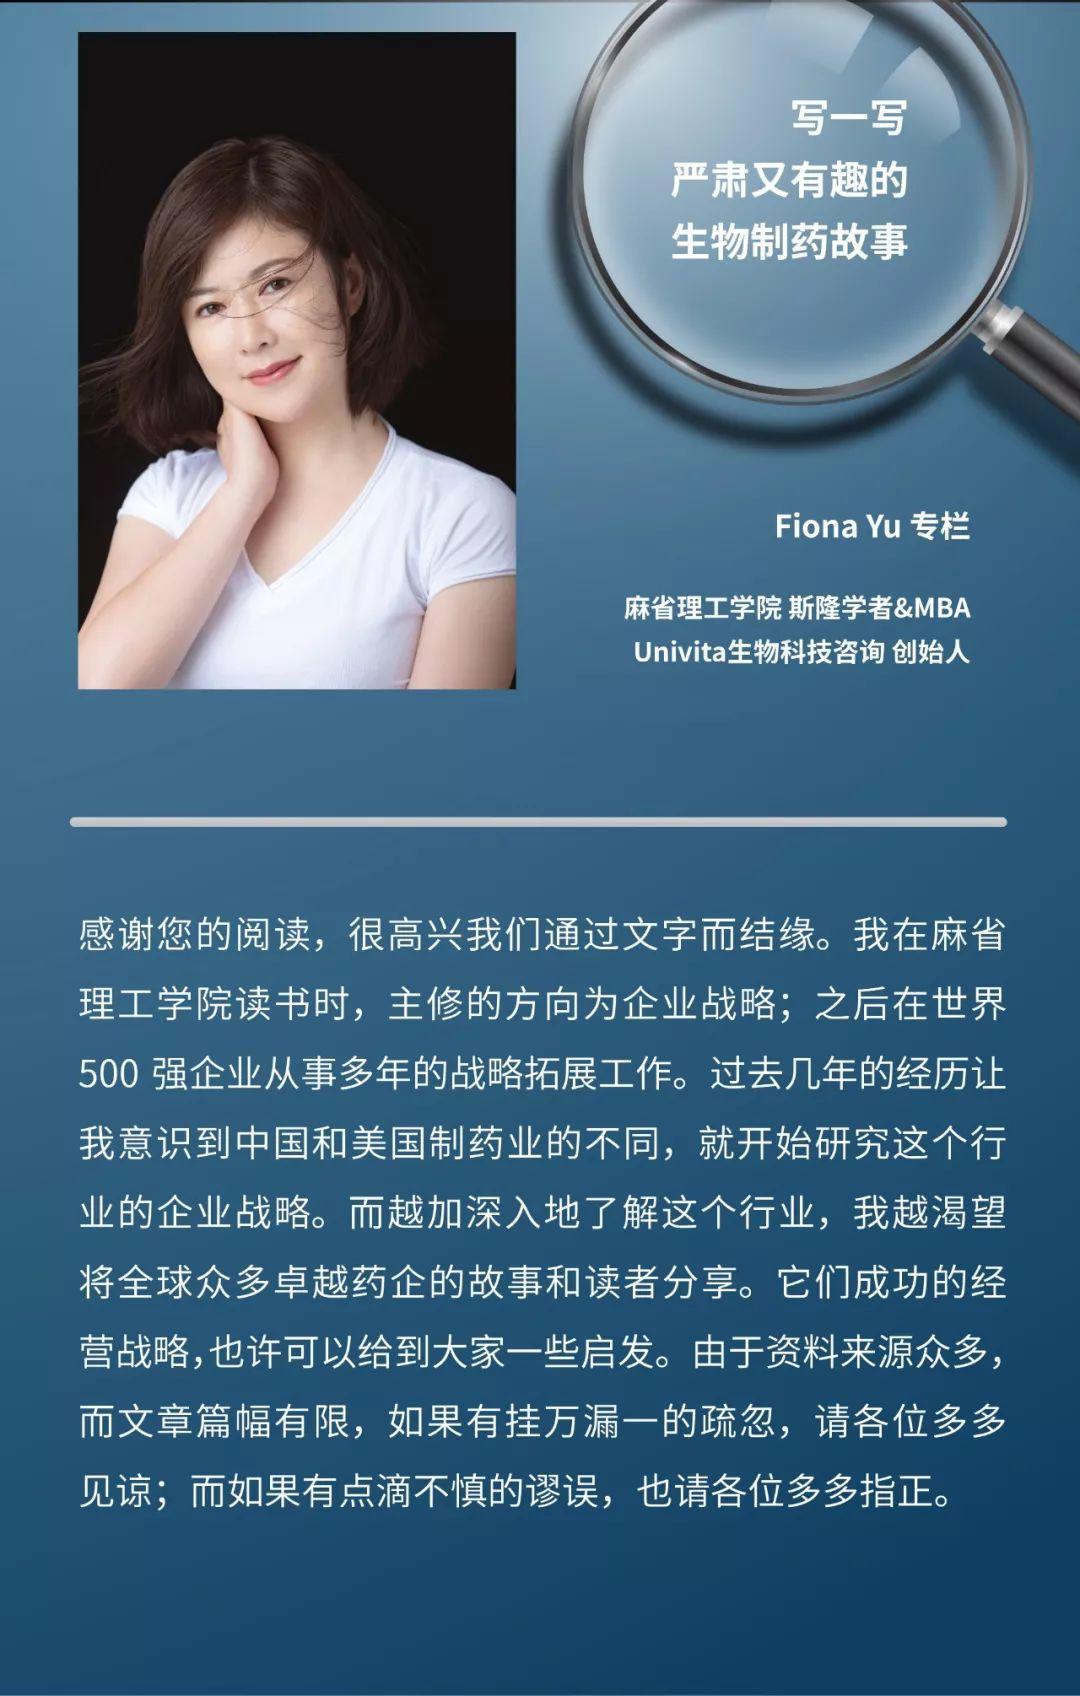 Fiona Yu专栏 | 靠兼并长大的赛诺菲(Sanofi),真正的绝招是啥?